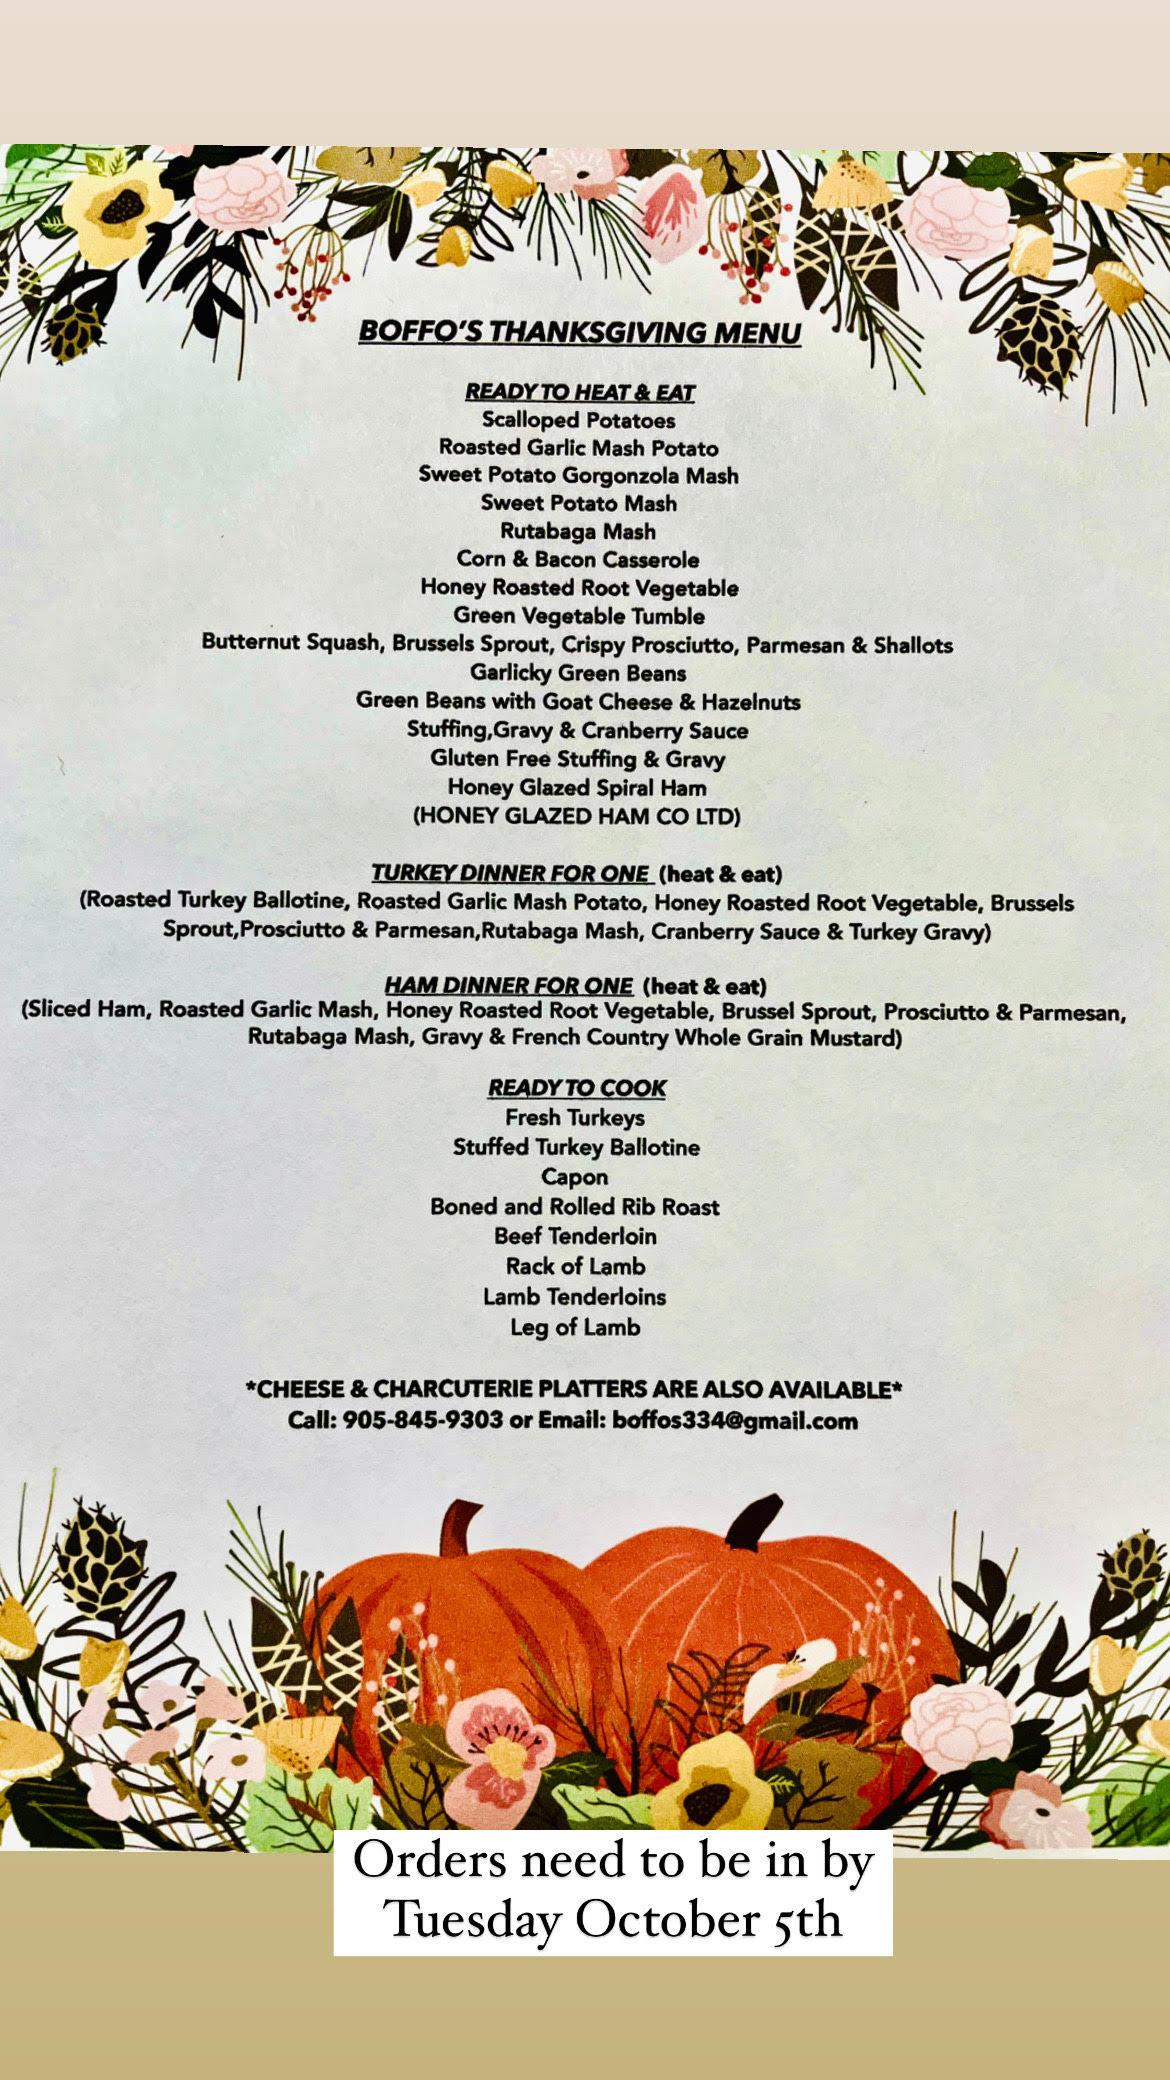 boffos-thanksgiving-menu